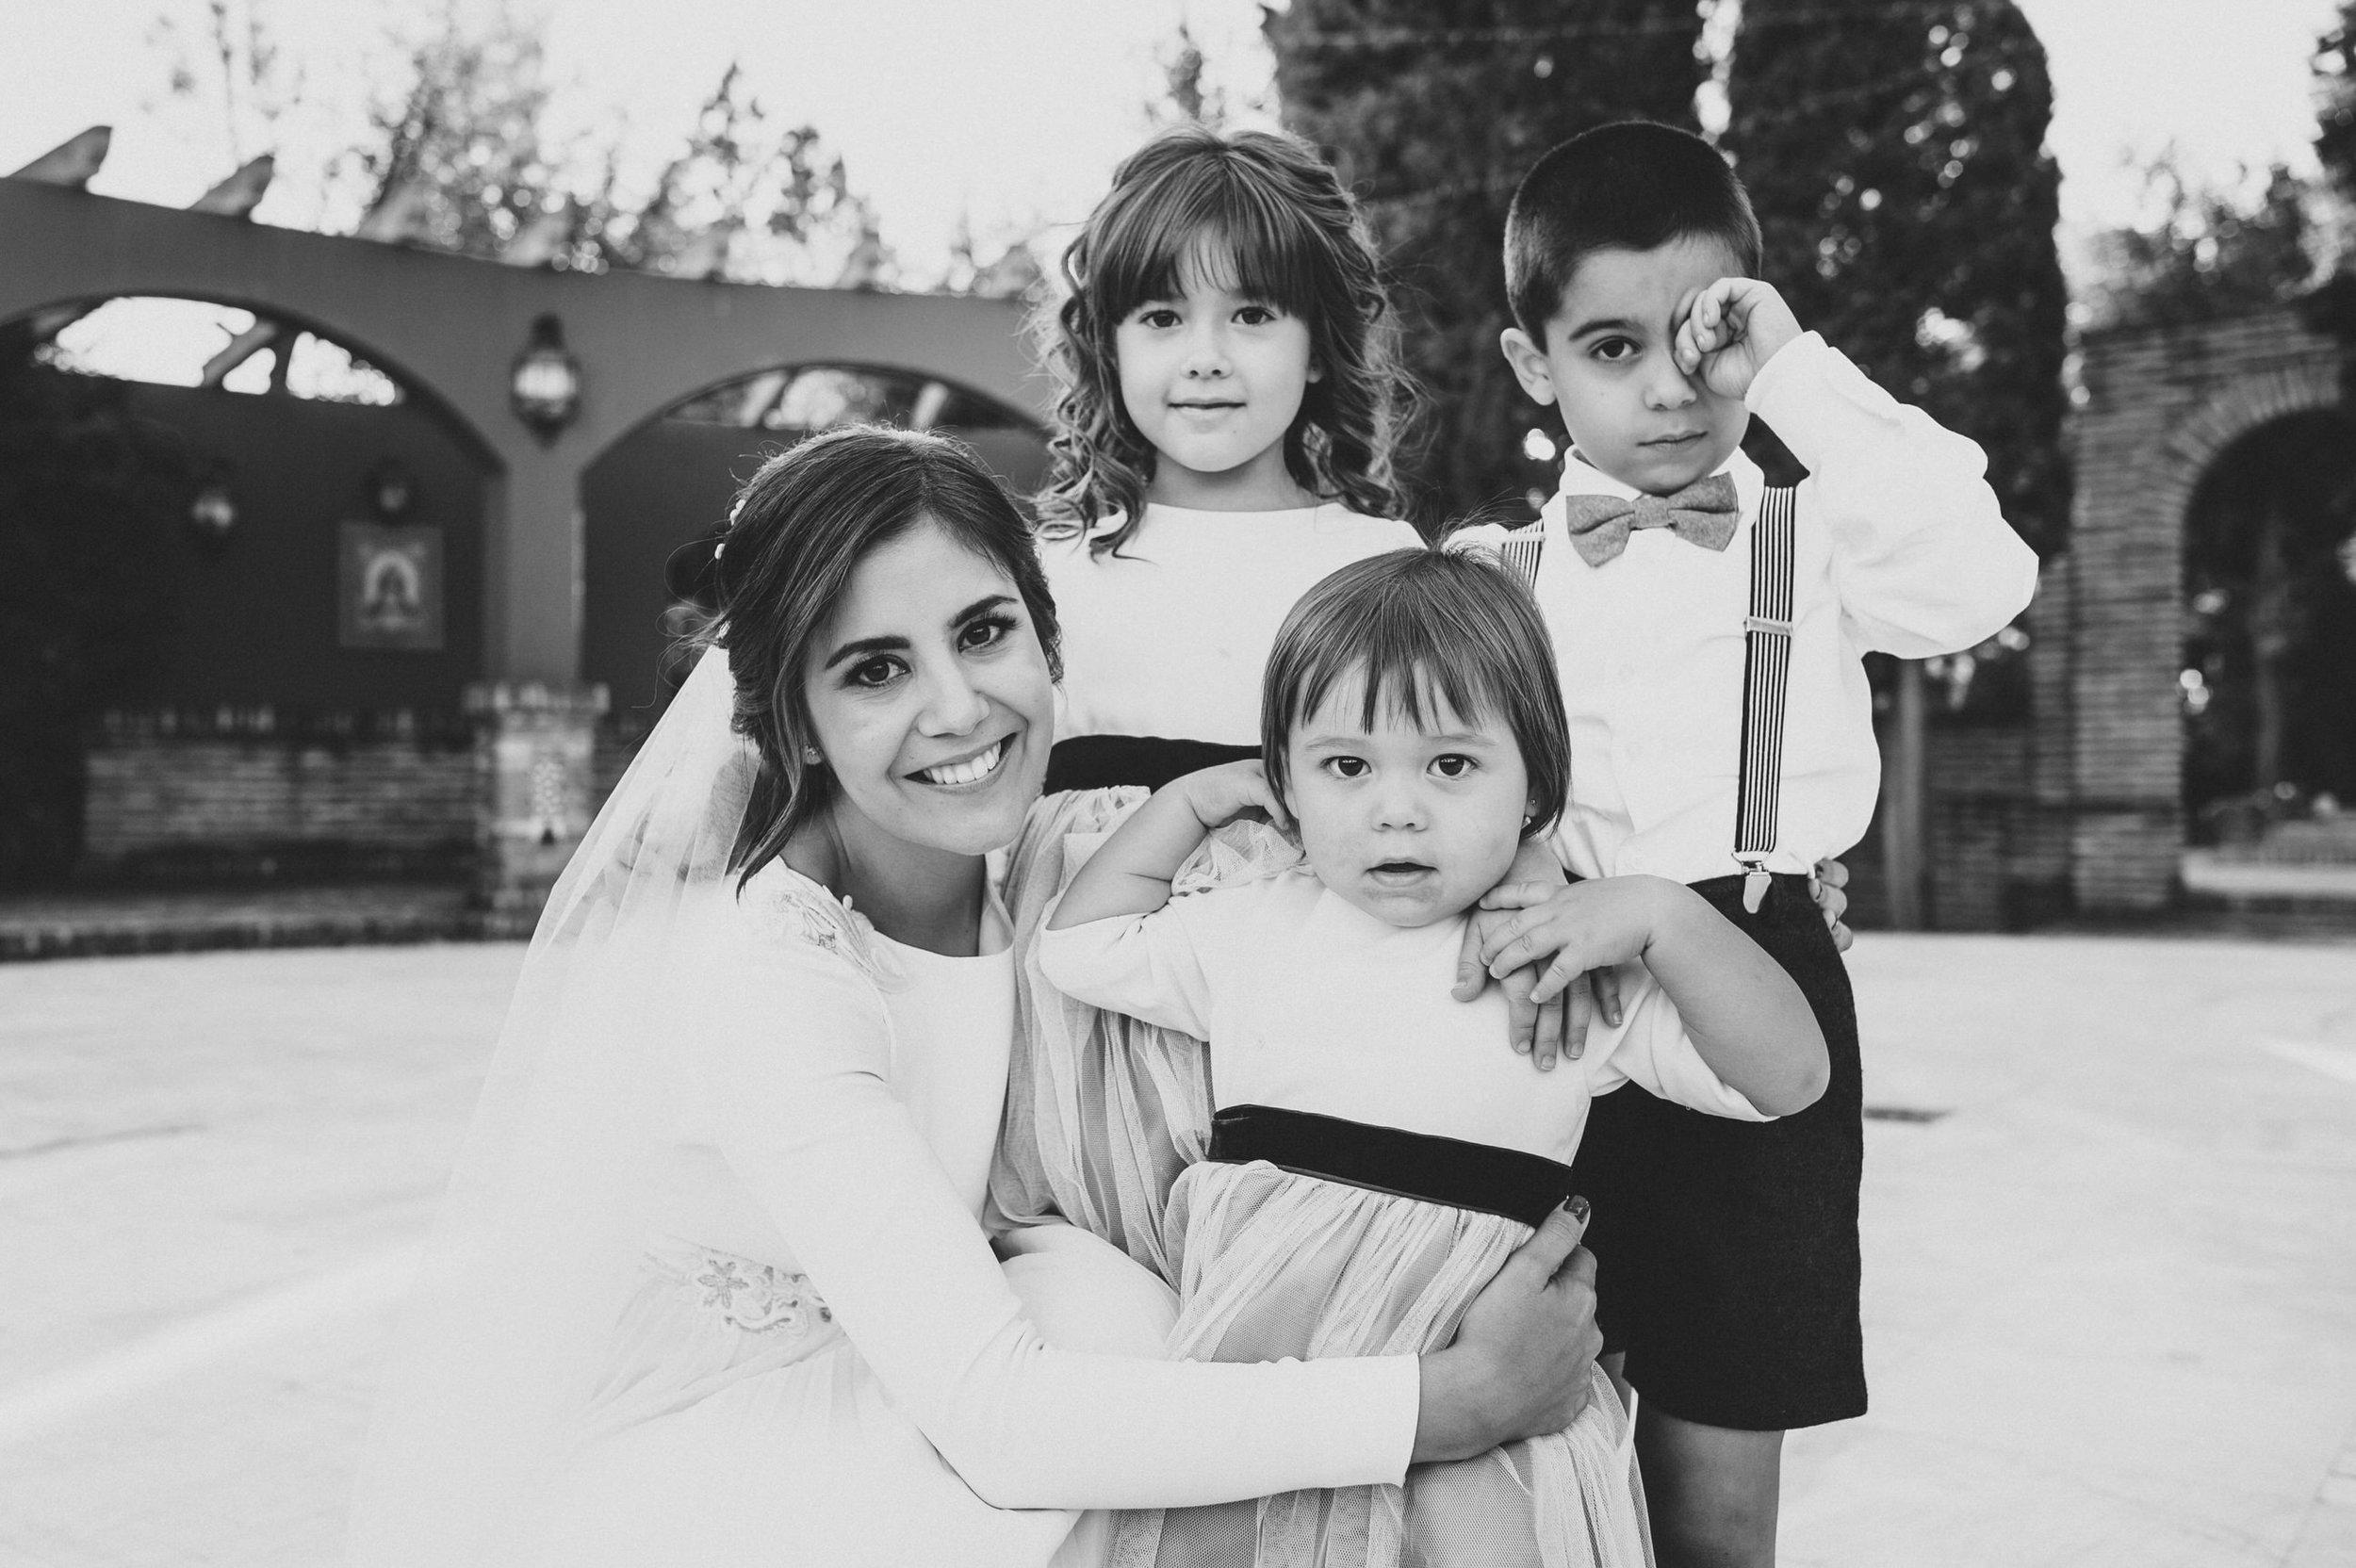 andres+amarillo+fotografo+boda+sevilla+santa+maria+de+la+blanca+al+yamanah (20).JPG